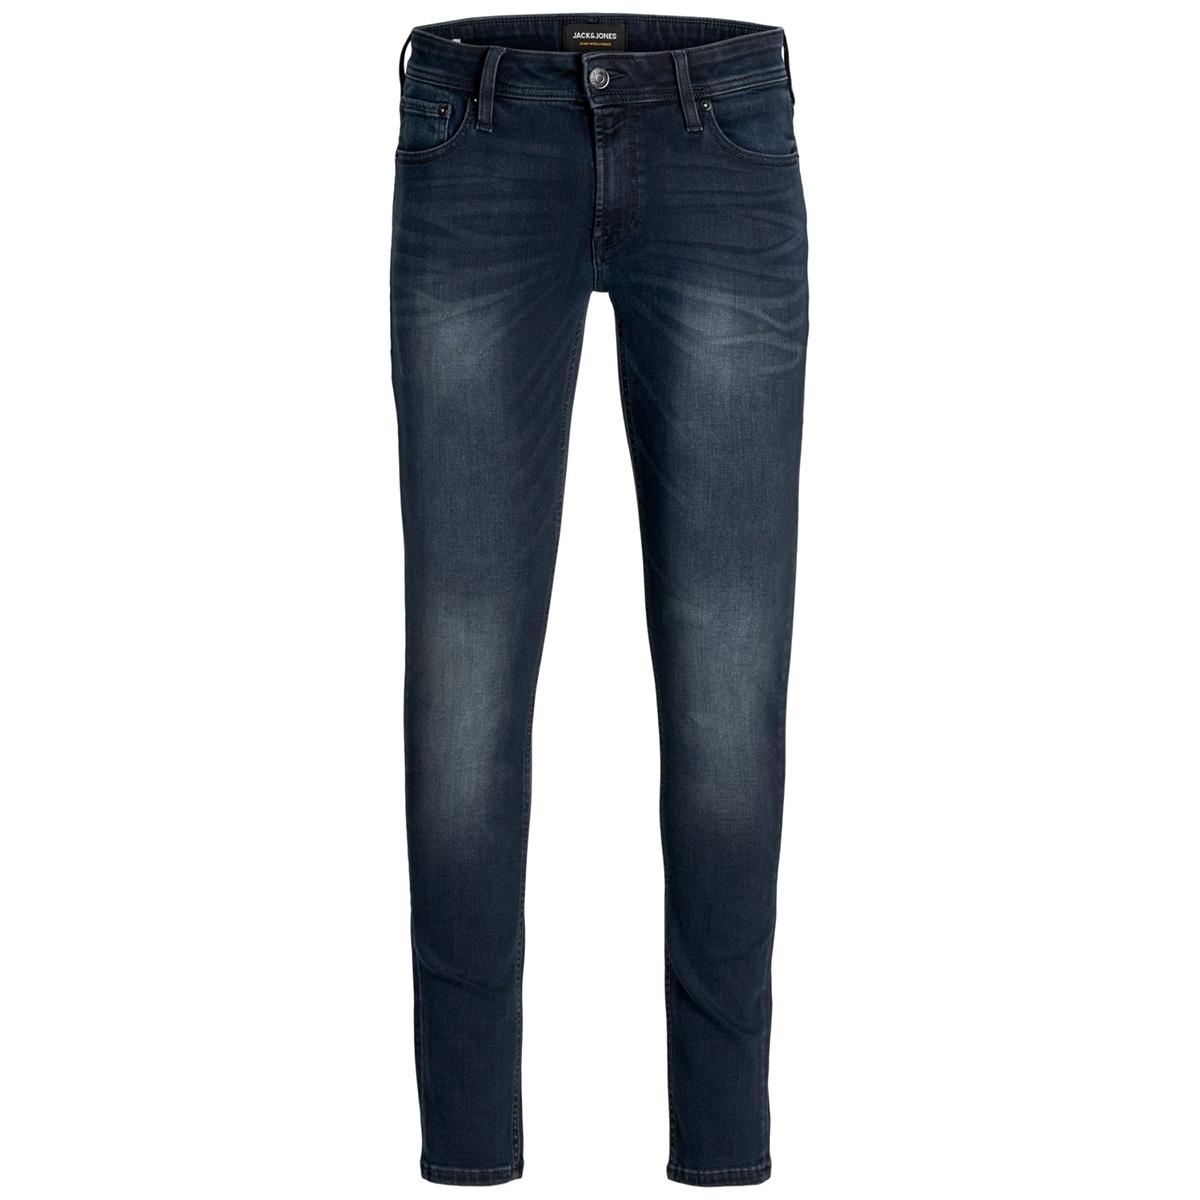 jjimike jjoriginal agi 004 12170808 jack & jones jeans blue denim